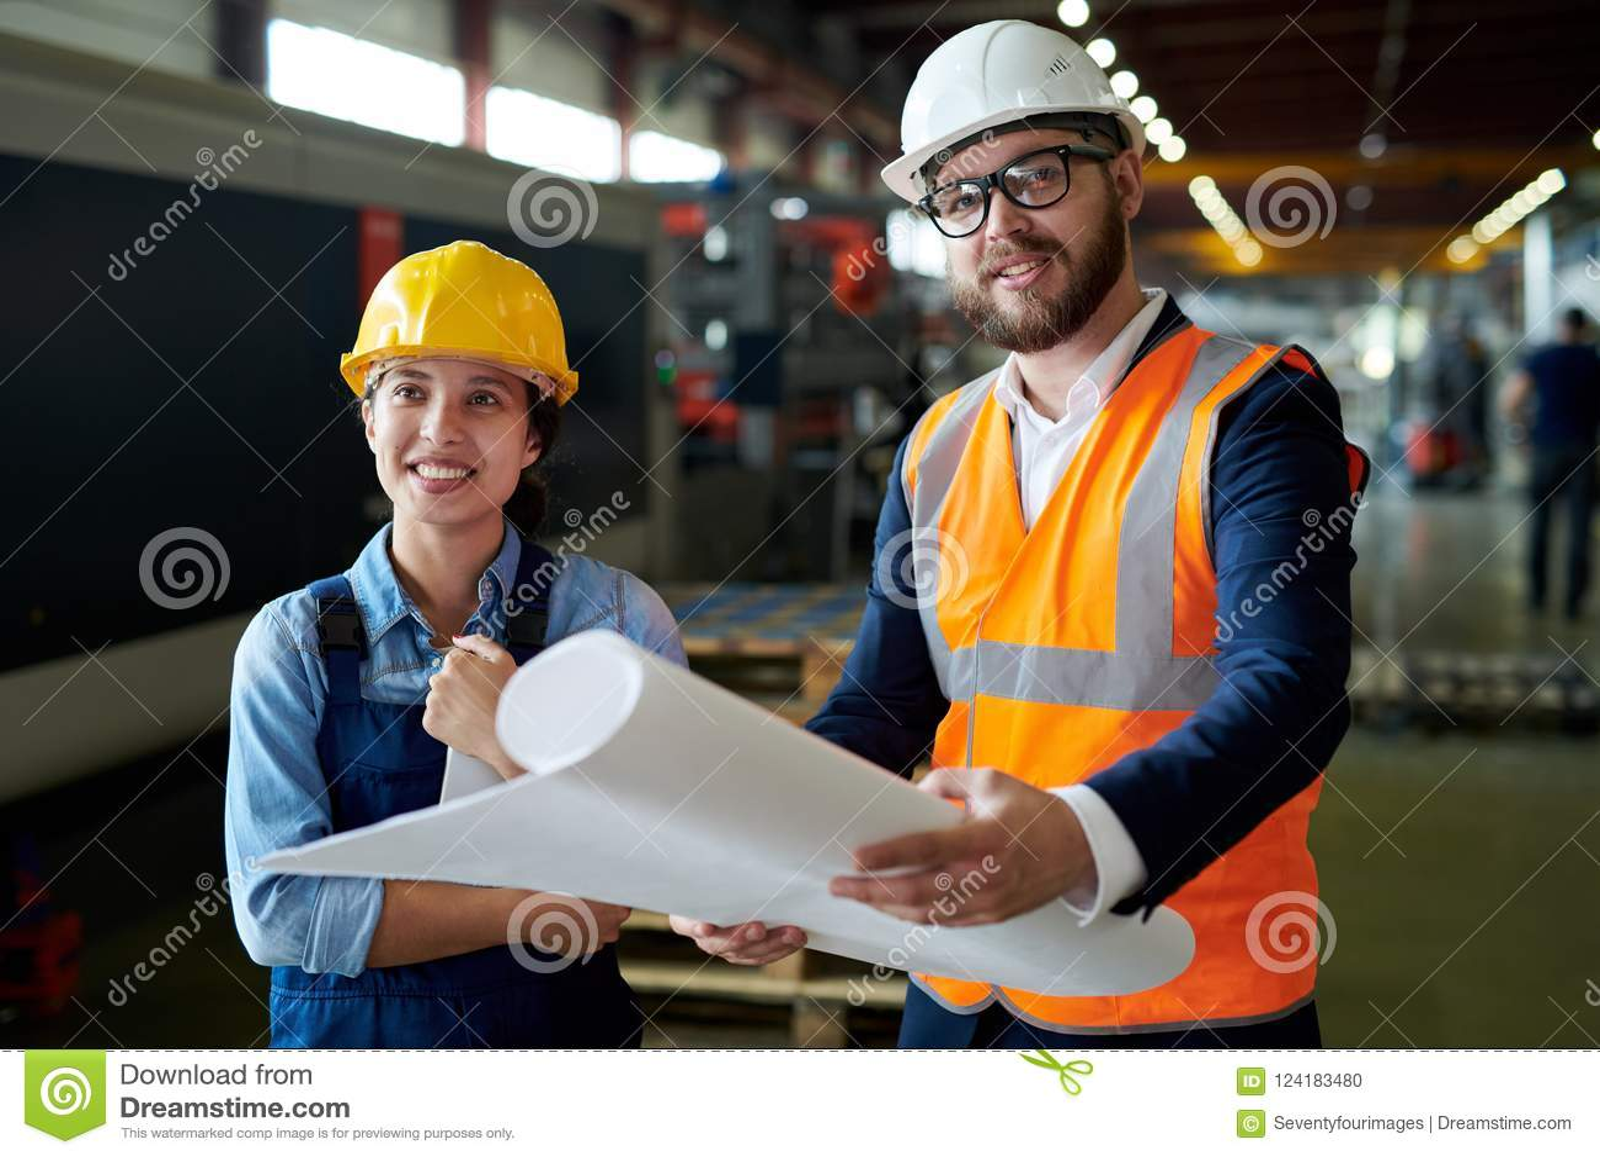 Smiling Engineers Holding Blueprints